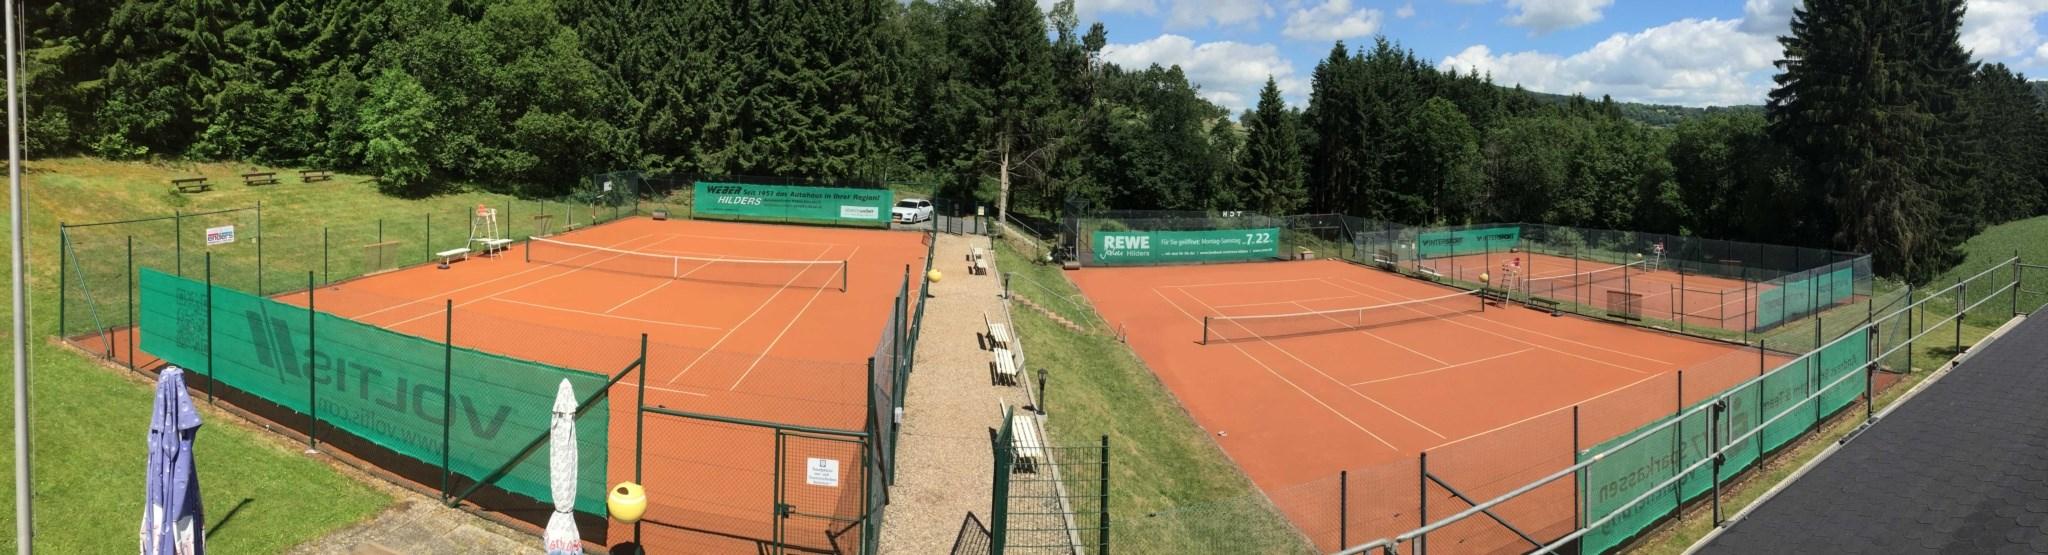 Tennisclub Blau-Weiß Hilders e.V.